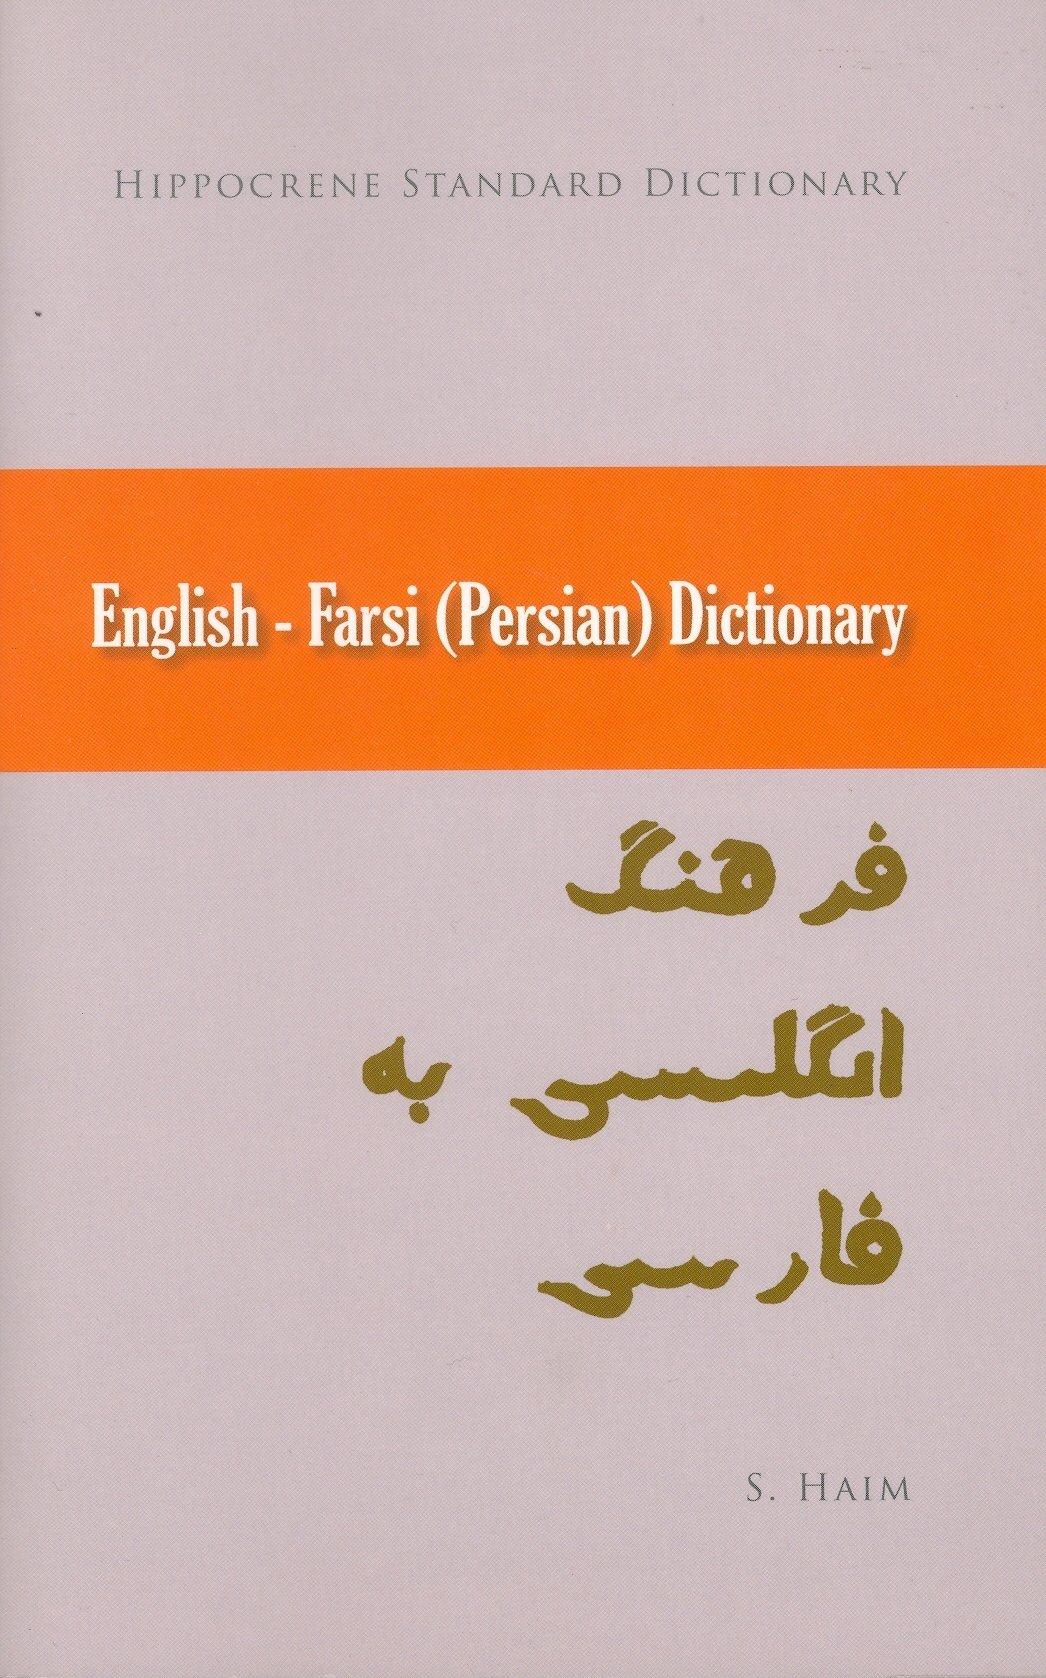 English Persian Dictionary S. Haim 20 Amazon.com Books